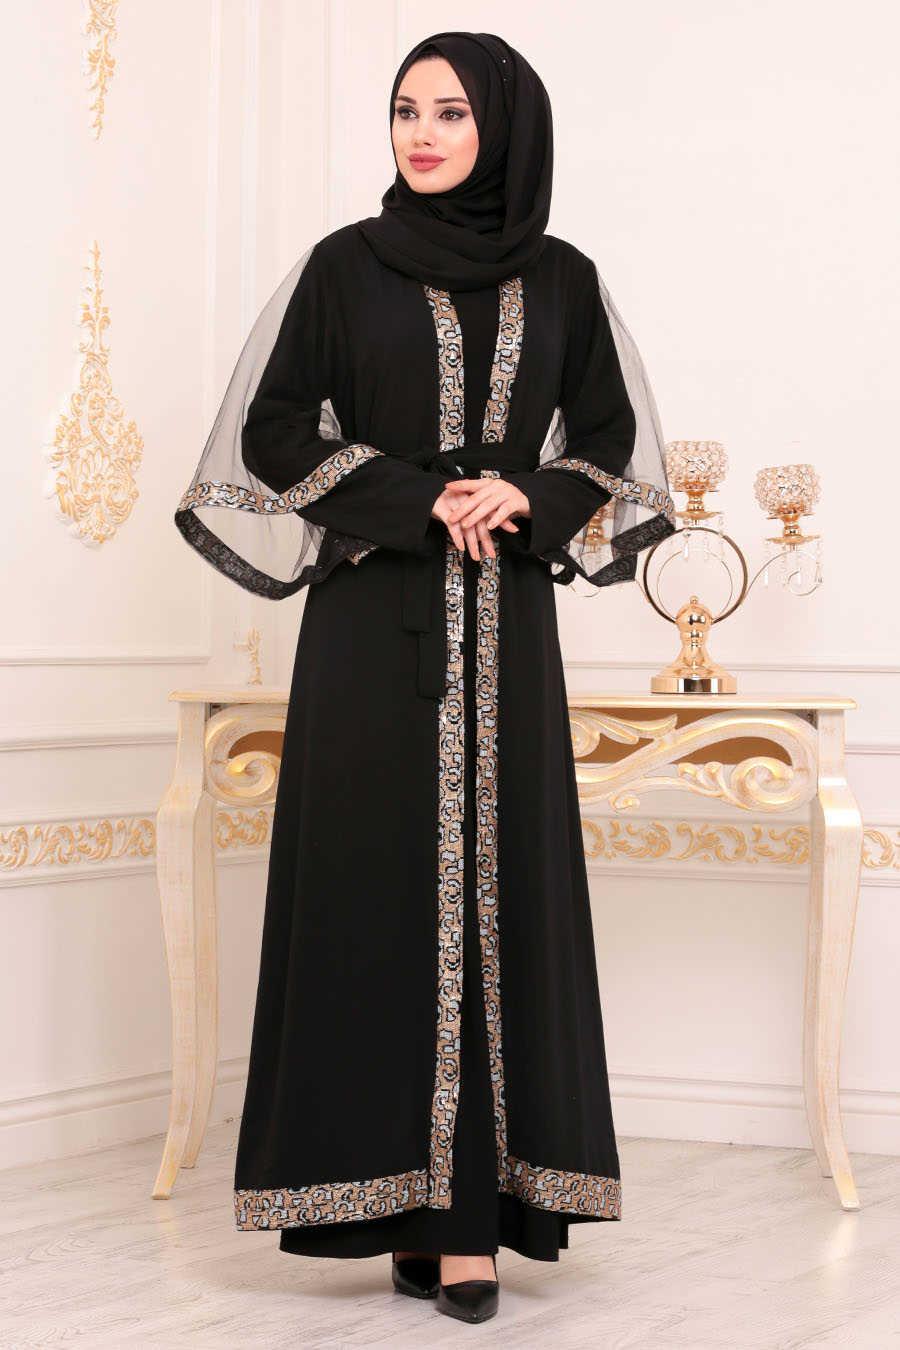 Black Hijab Daily Dress 95840S